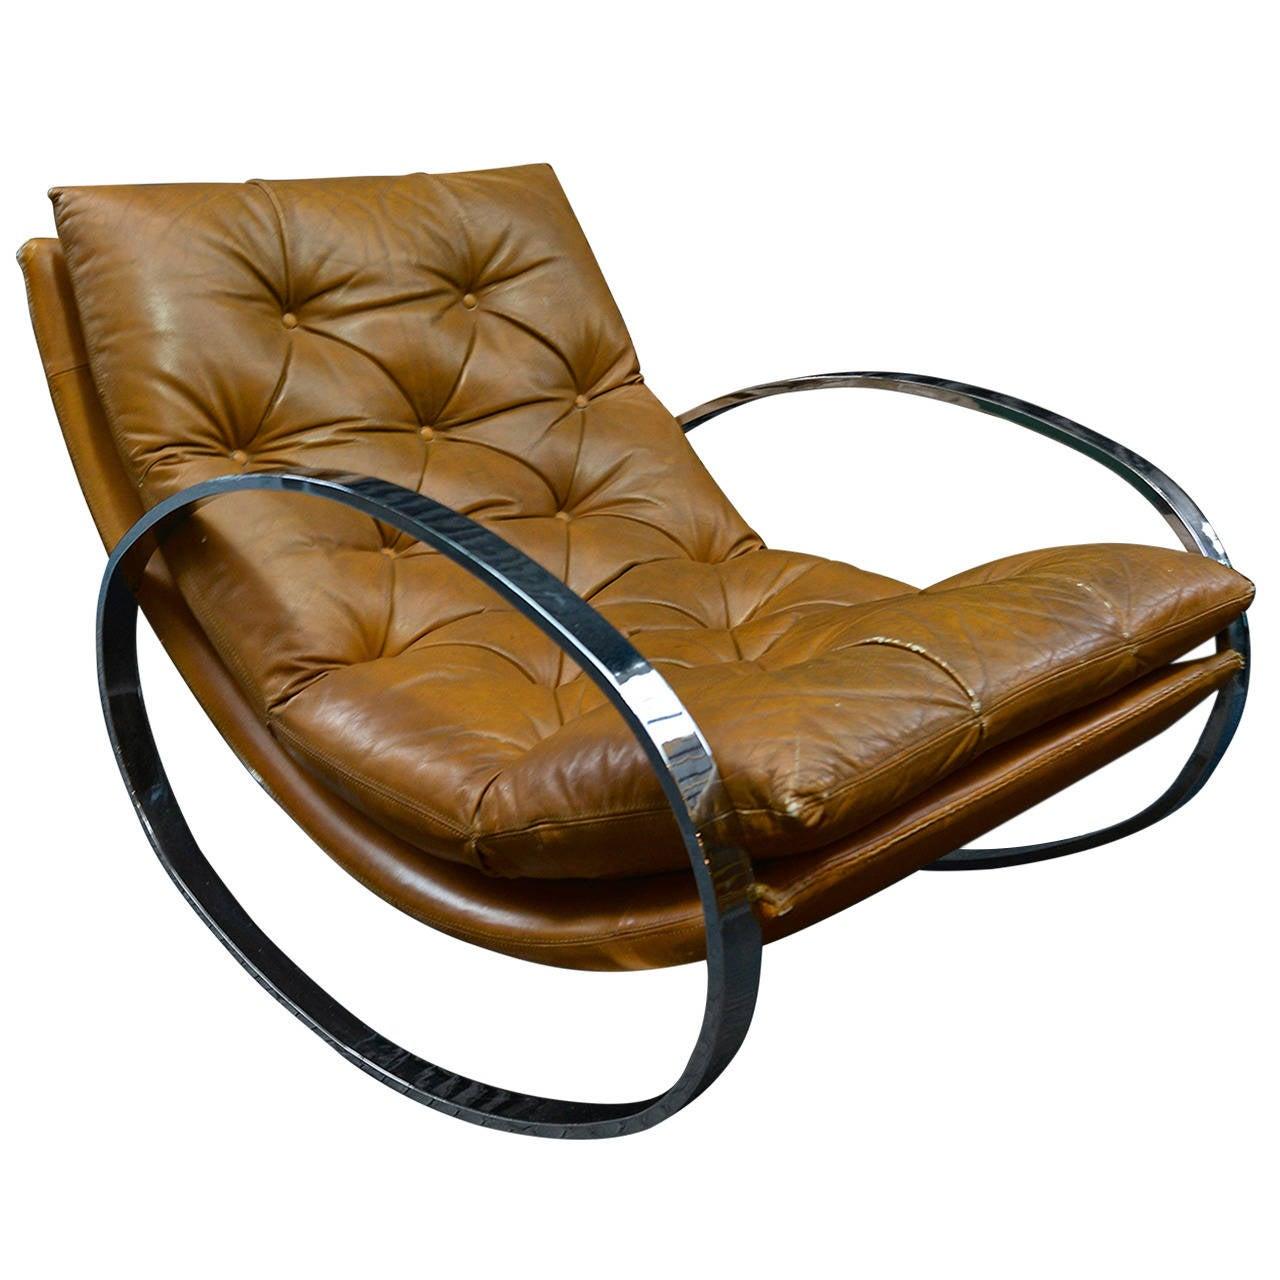 Milo baughman rocking chair at 1stdibs